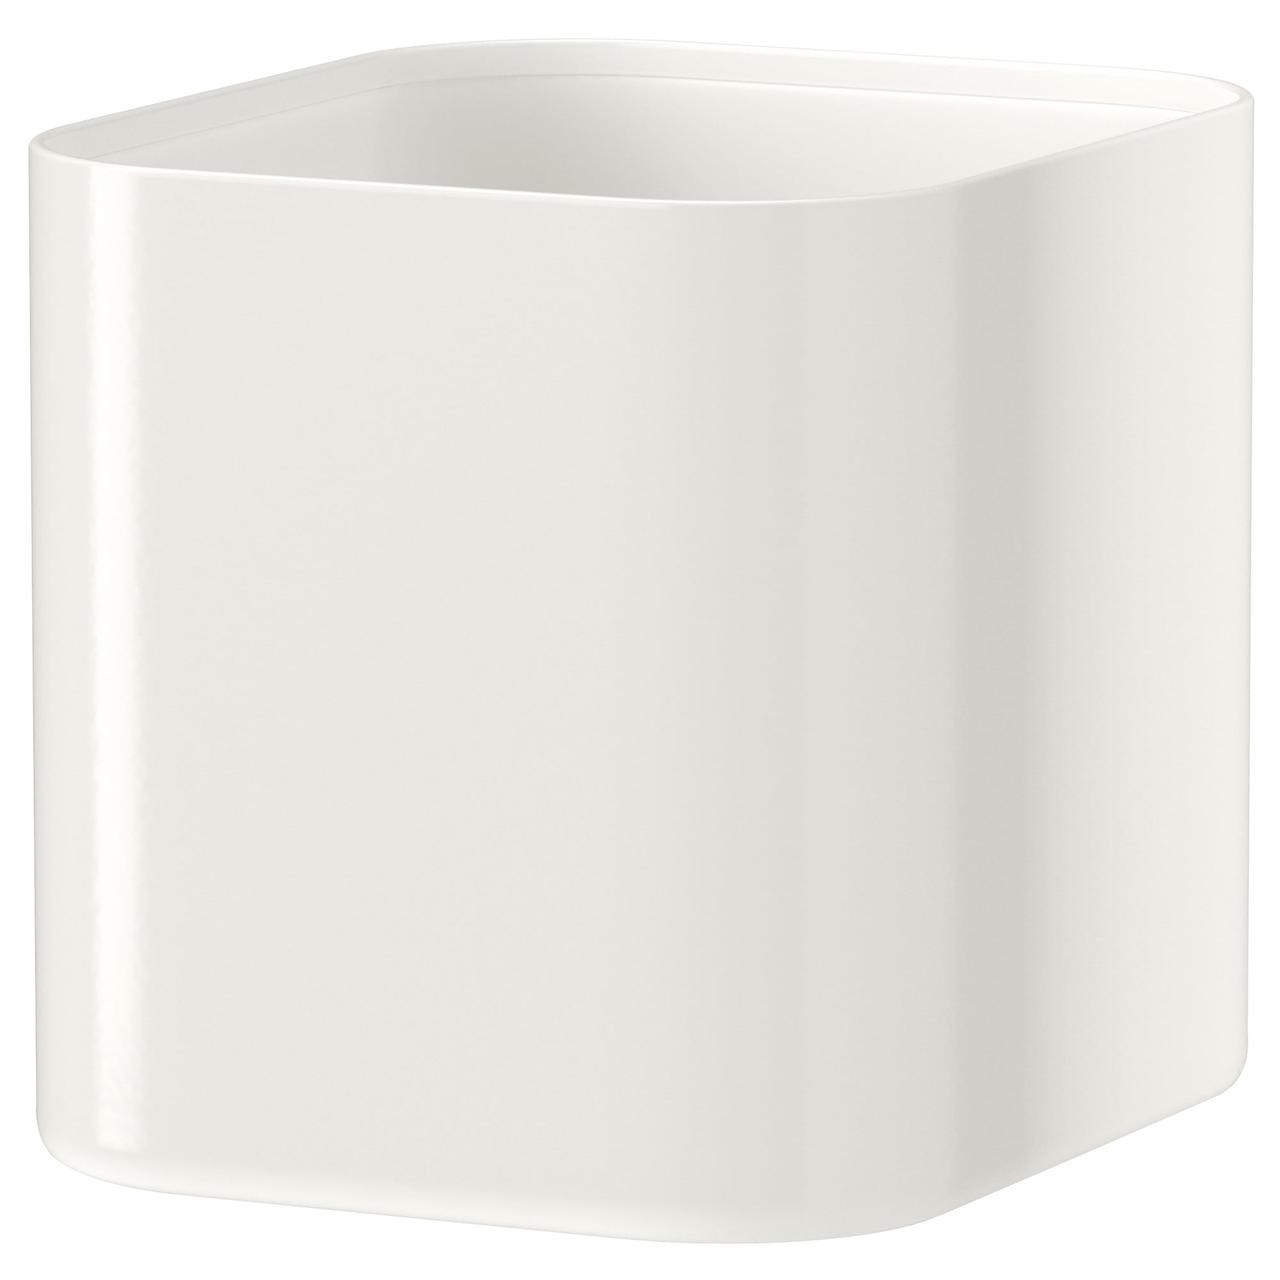 IKEA SKADIS (203.207.98) Контейнер